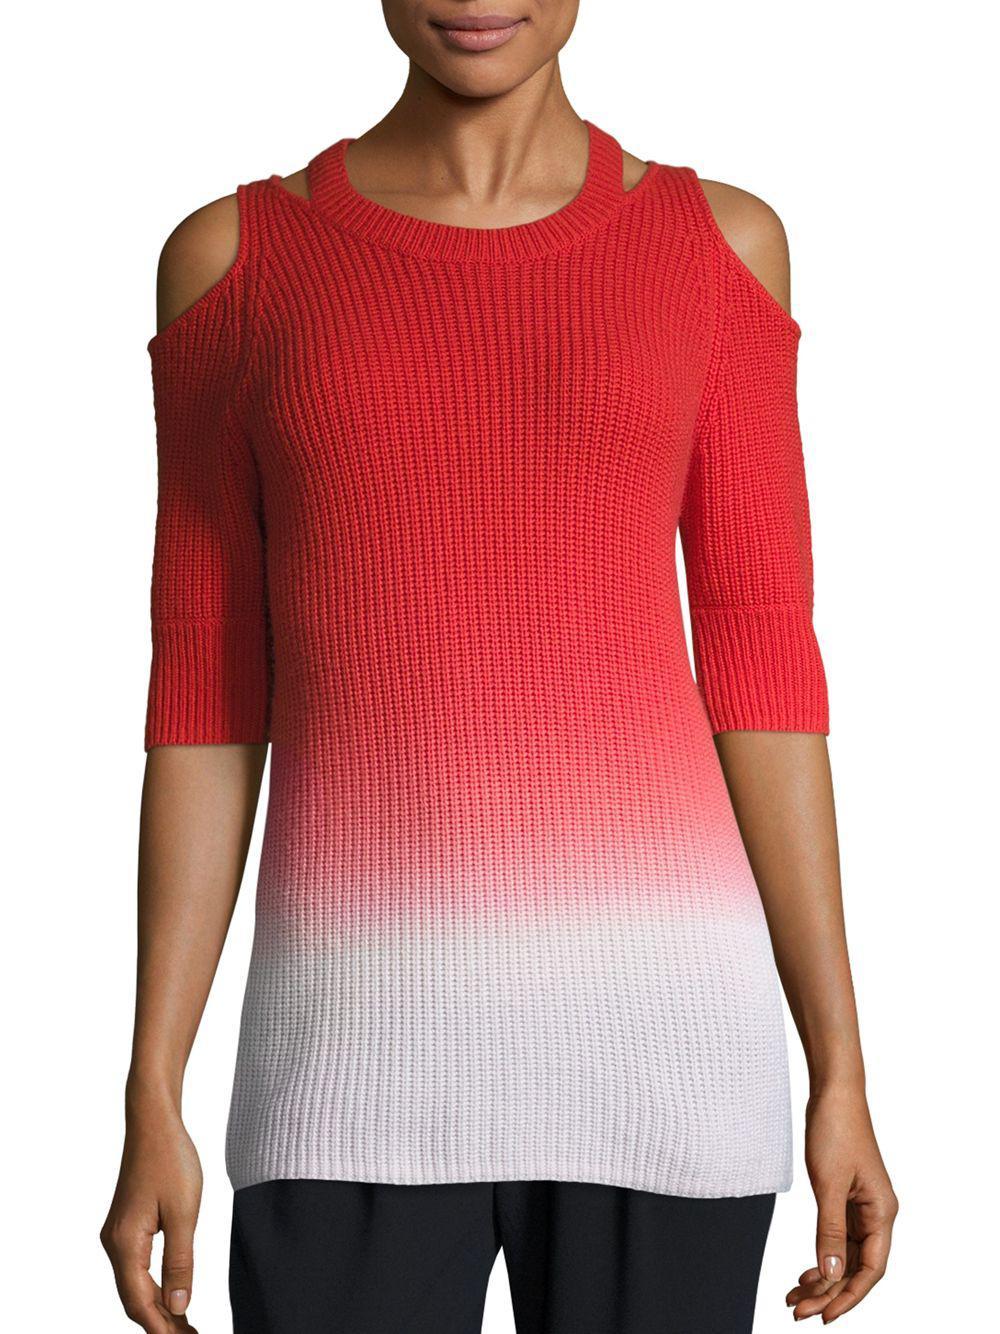 a7200891b297 Lyst - Zoe Jordan Aristotle Ombre Cold-shoulder Sweater - Save 58%